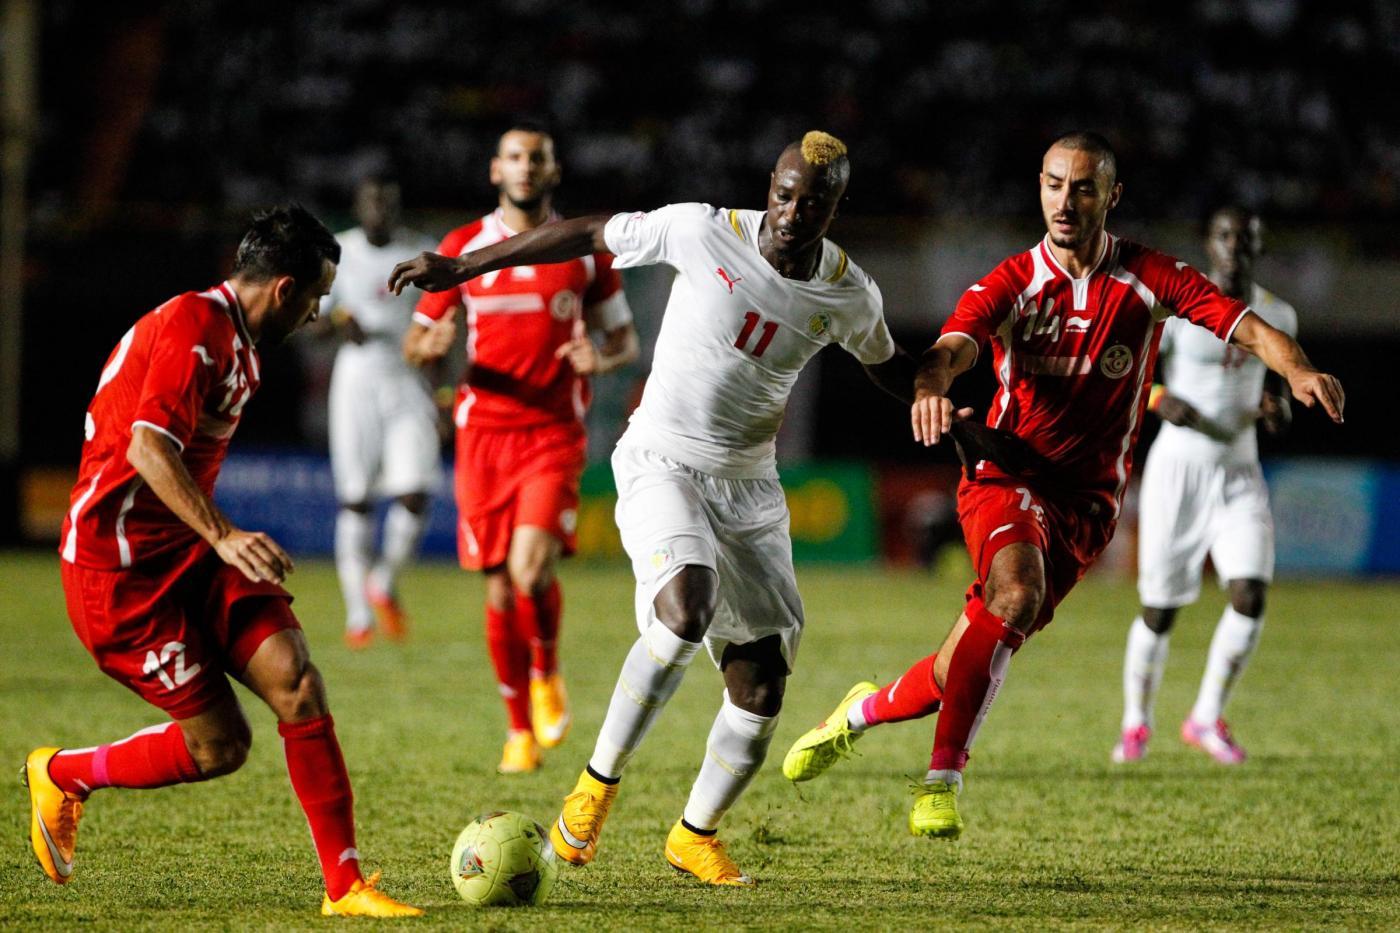 Coppa d'Africa 2015 in Guinea Equatoriale, Marocco escluso